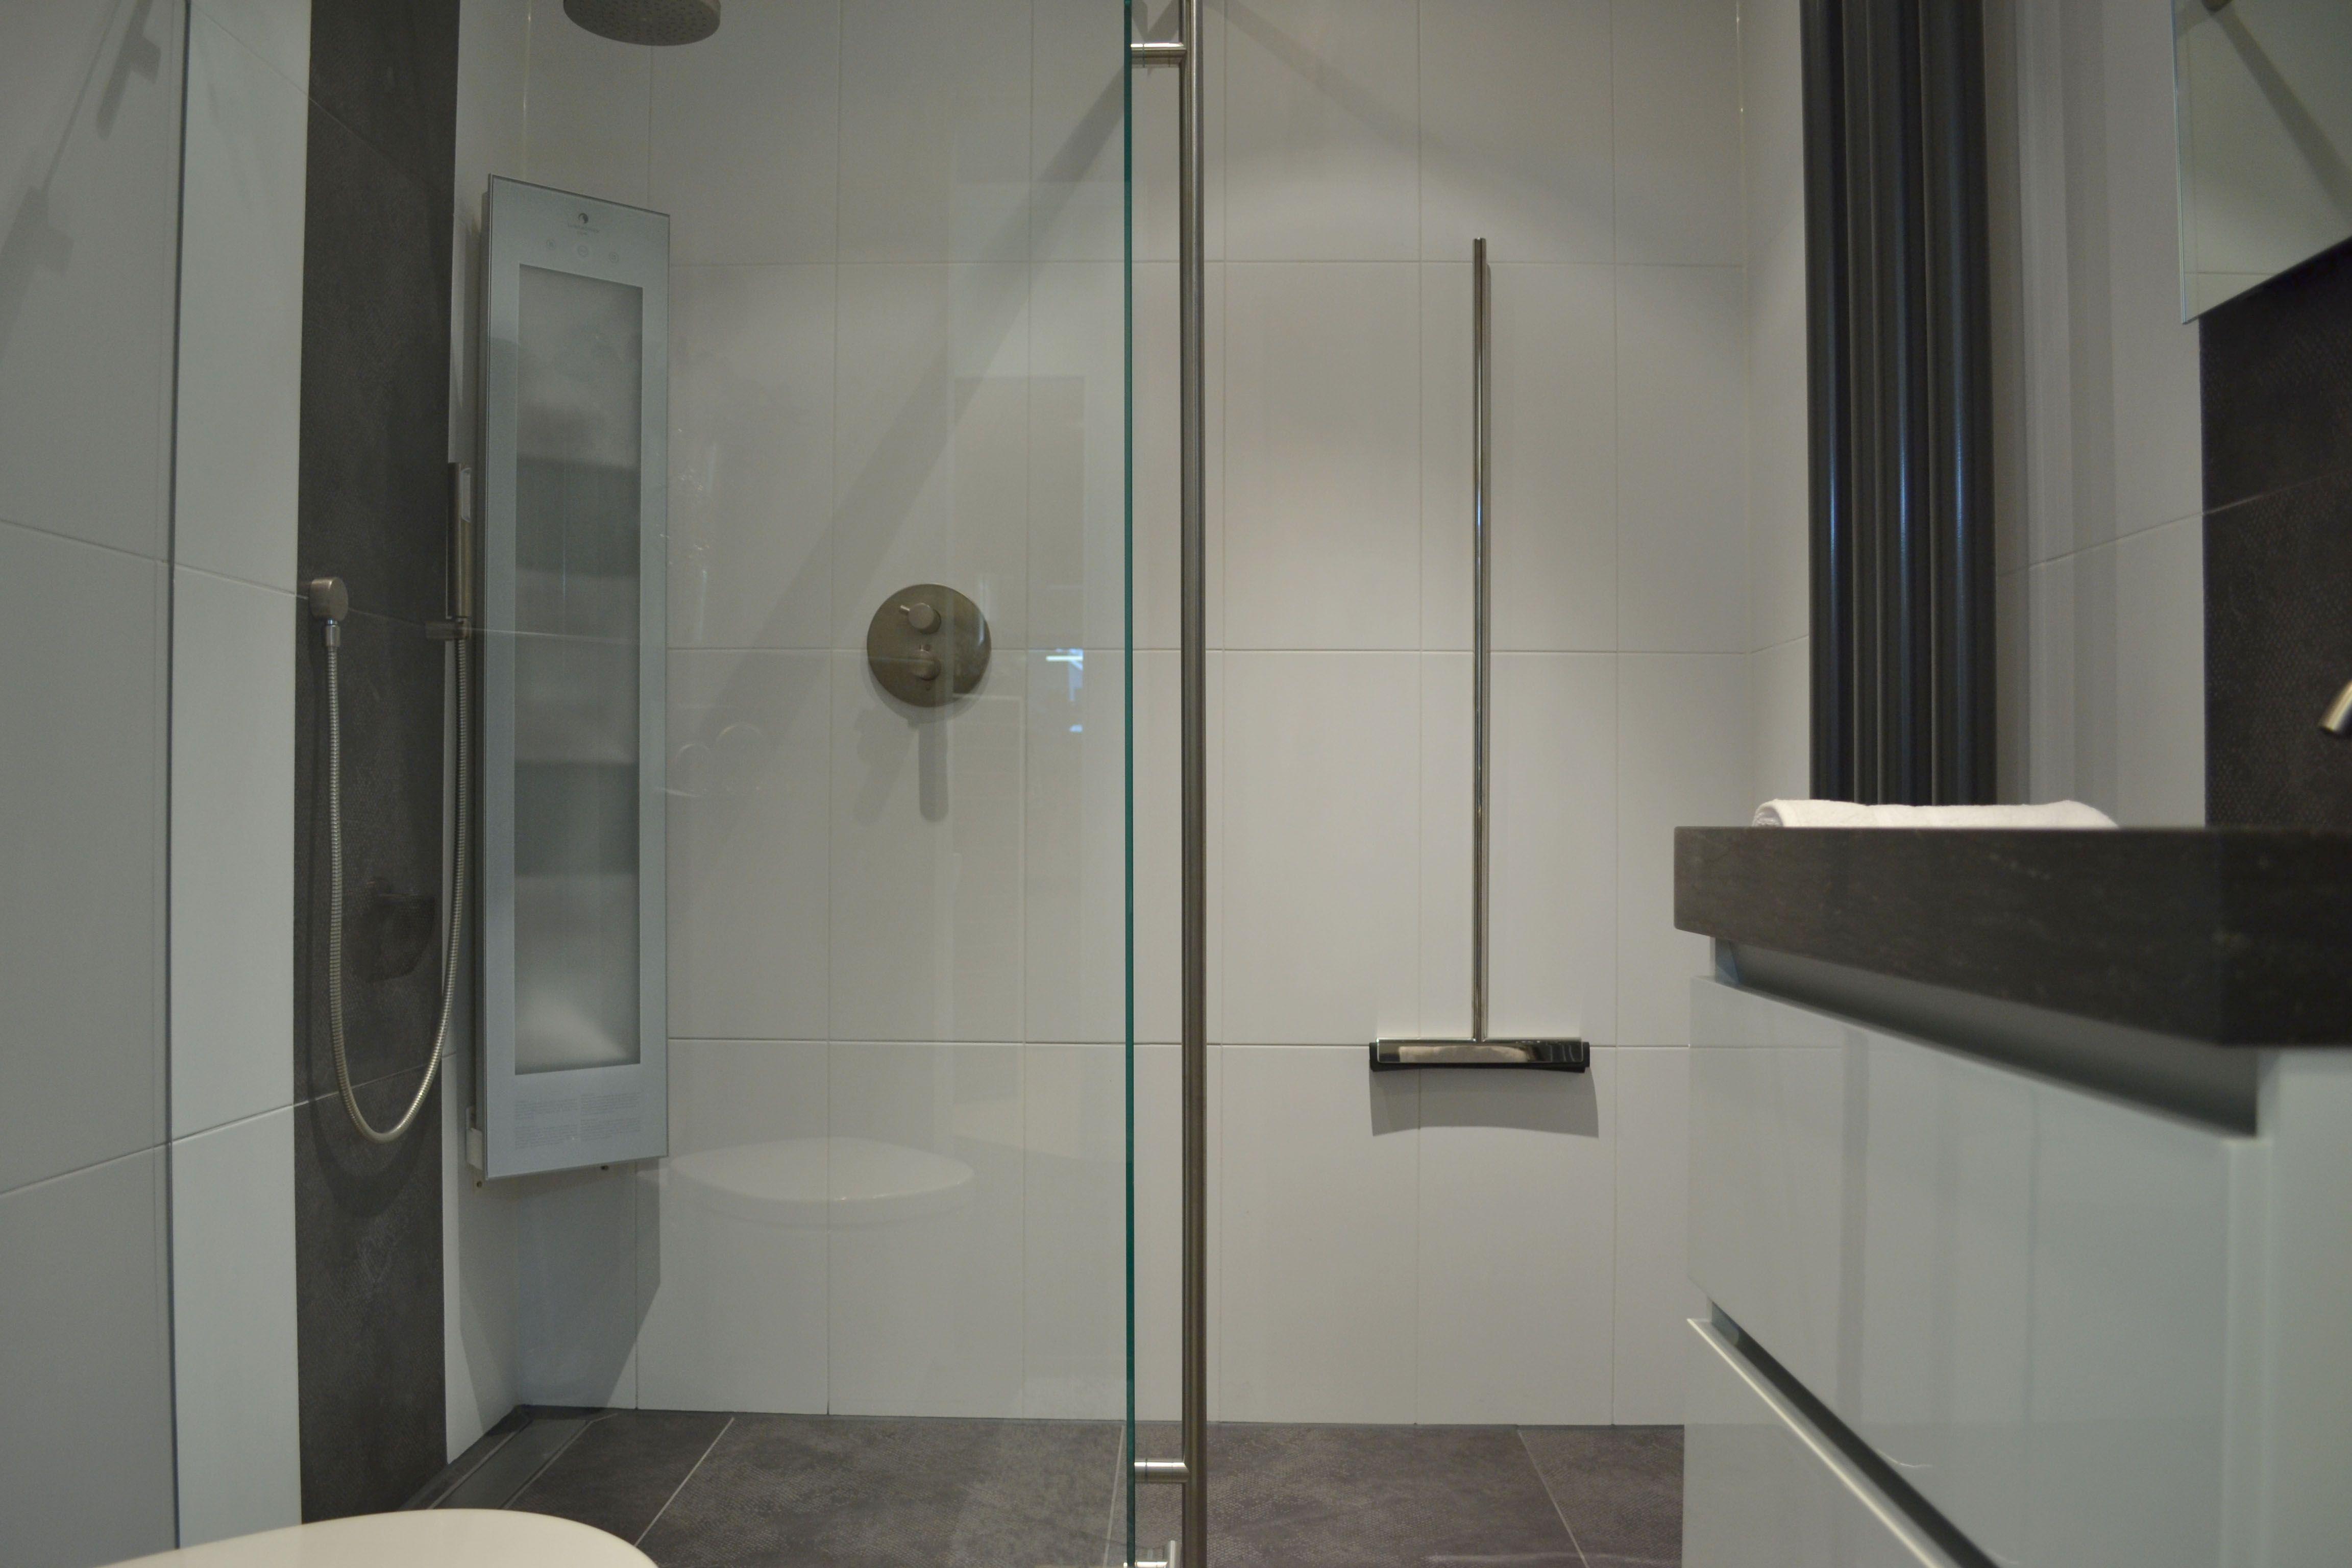 Badkamer Pimpen Badkamerverlichting : Badkamerverlichting rvs born stoere badkamer met rvs hout en